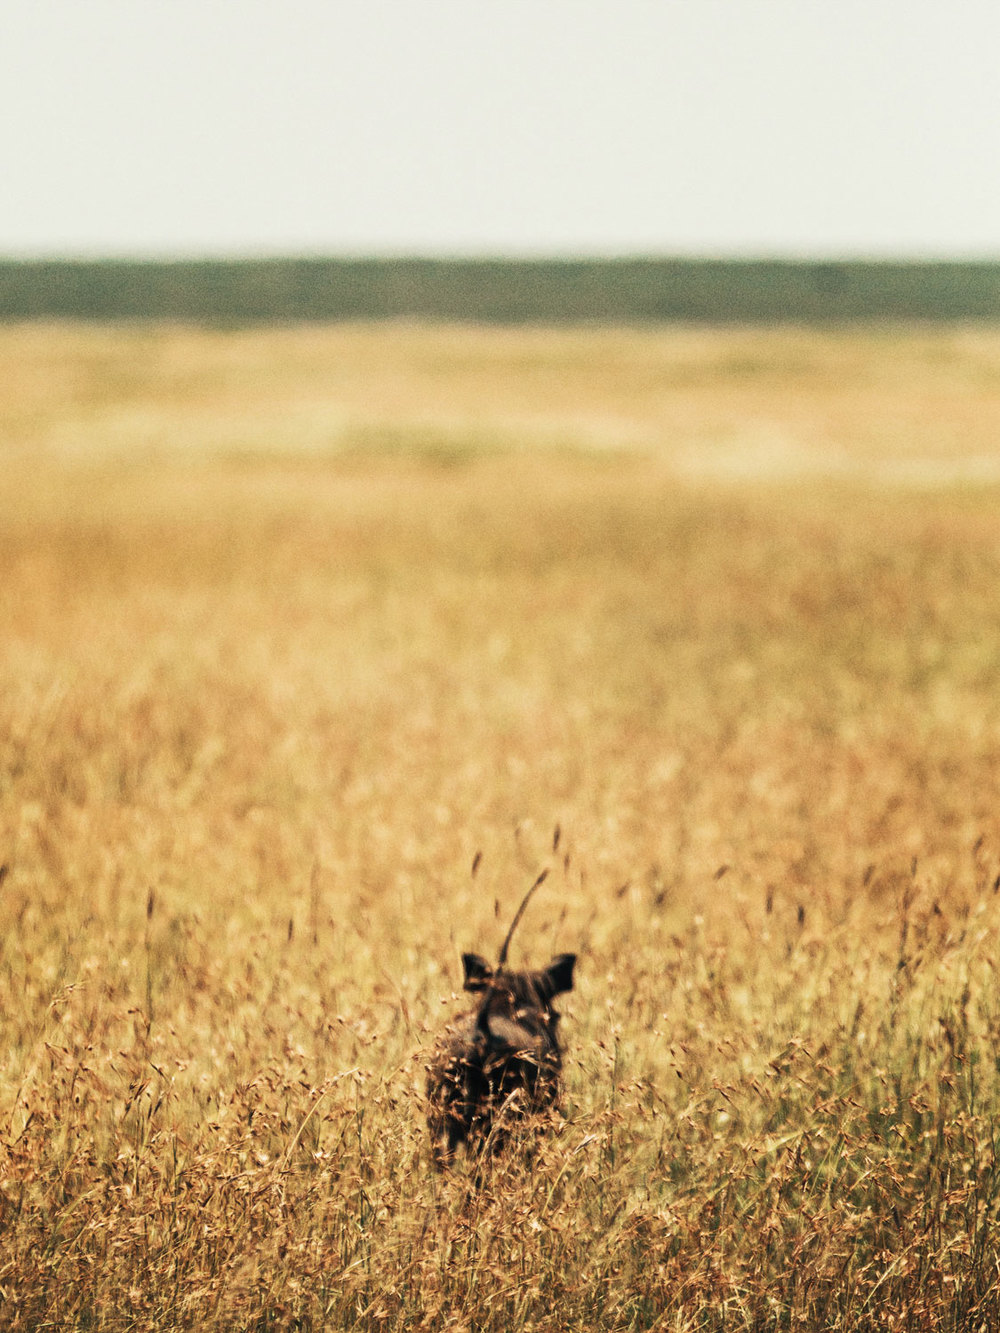 CallieGiovanna_Africa_Tanzania_Serengeti_20150101_08222.jpg